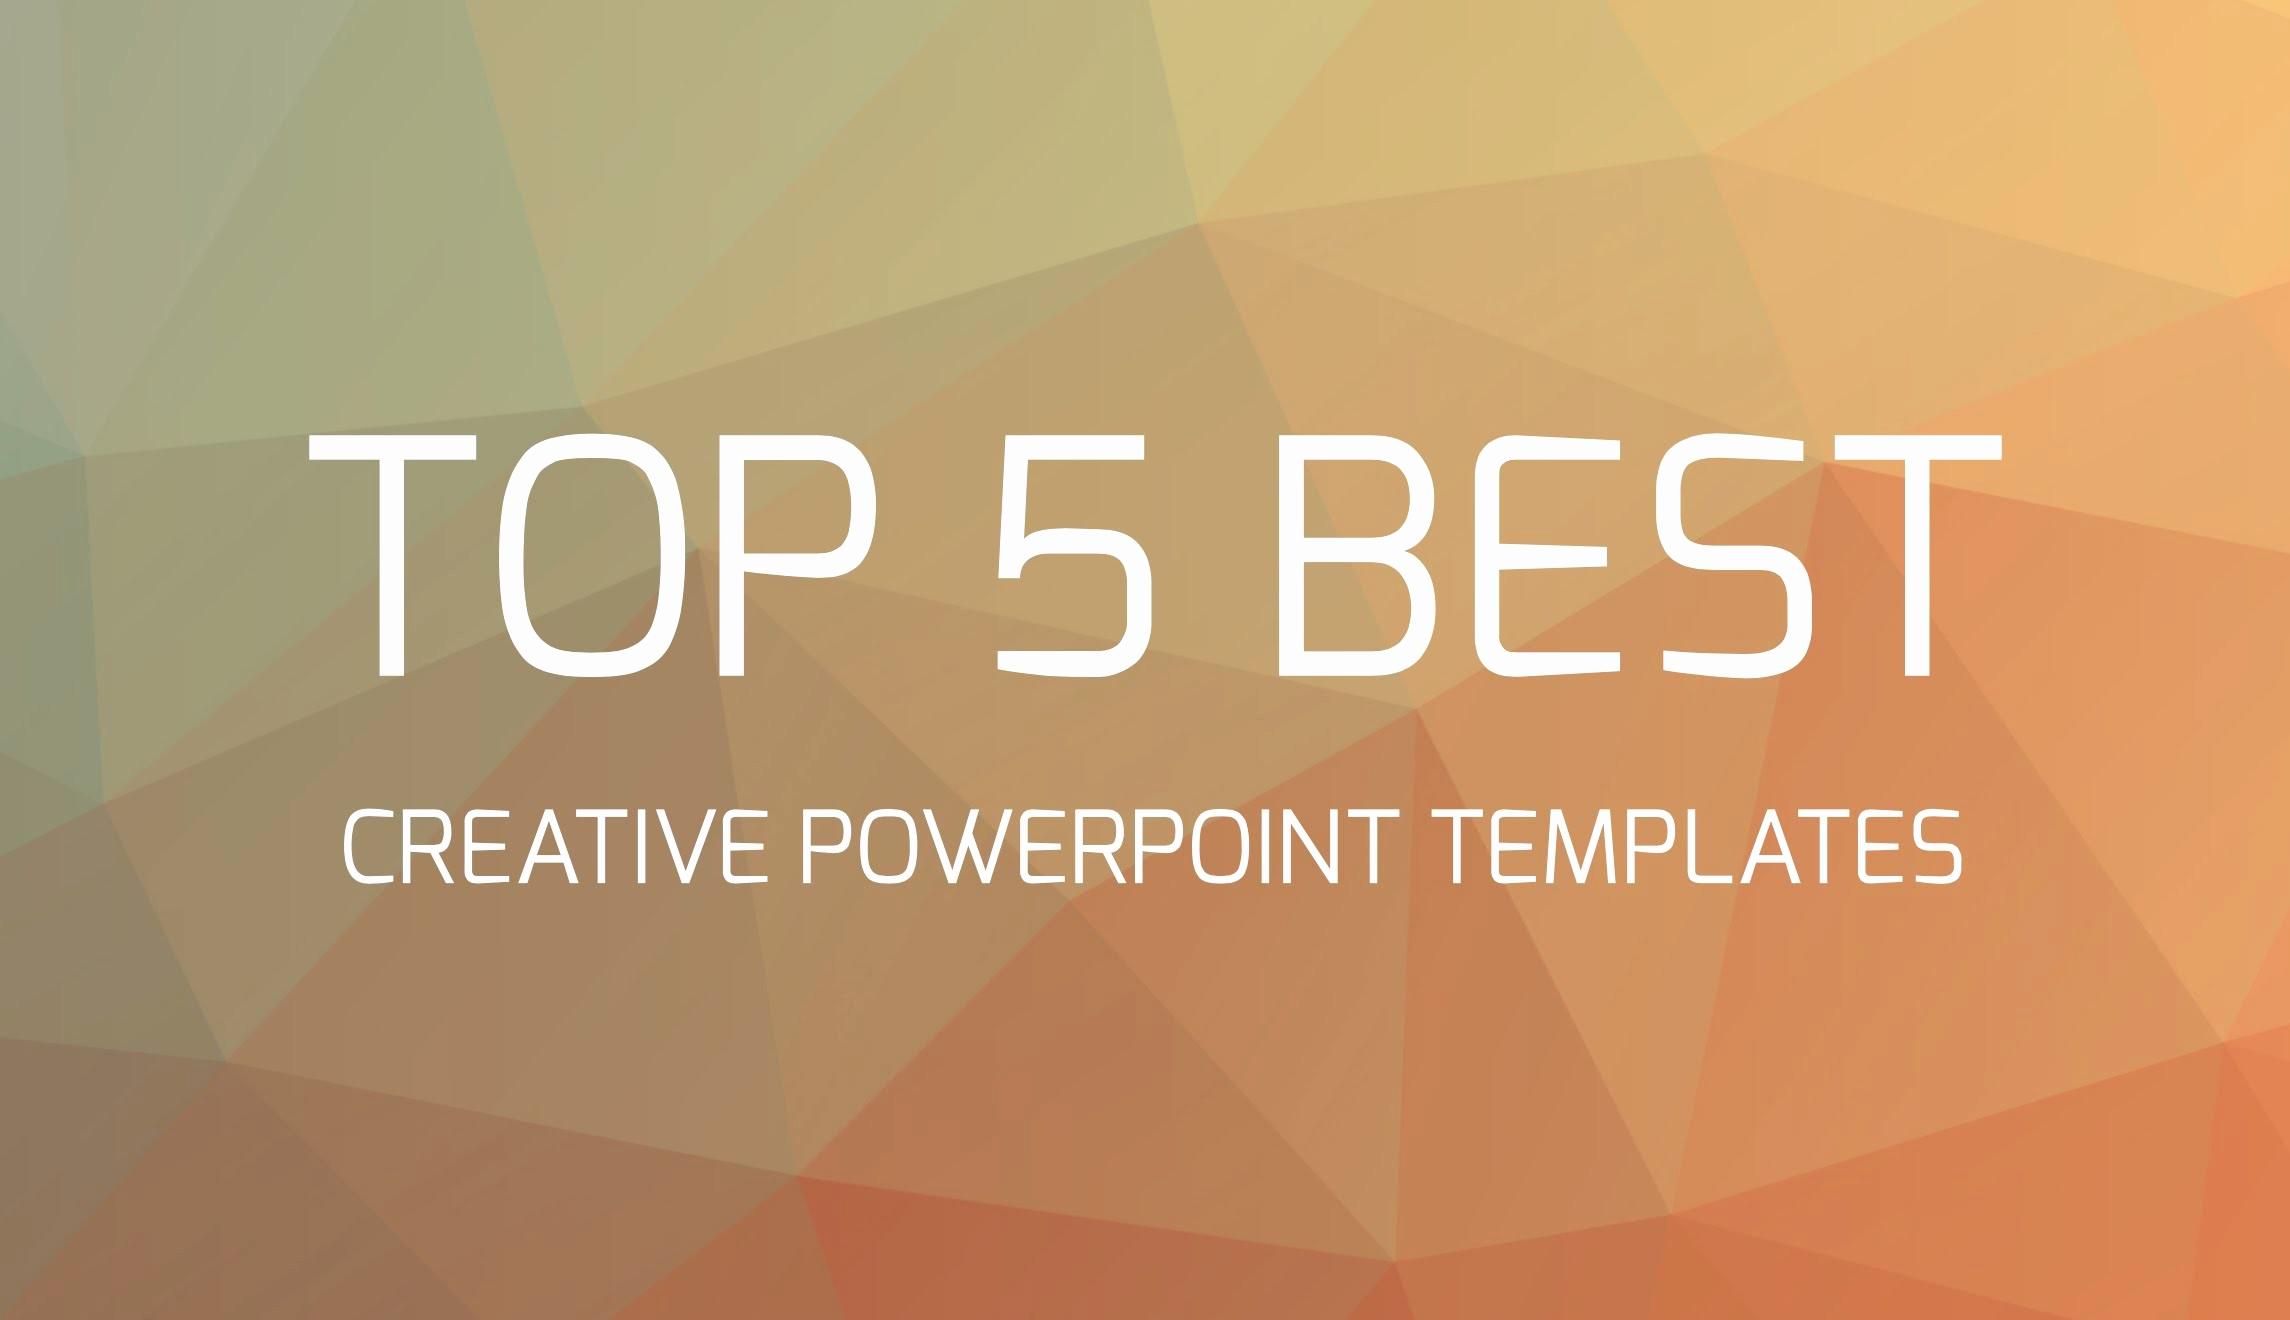 Best Powerpoint Templates Free Download Unique 42 Cool Powerpoint Backgrounds ·① Download Free Awesome